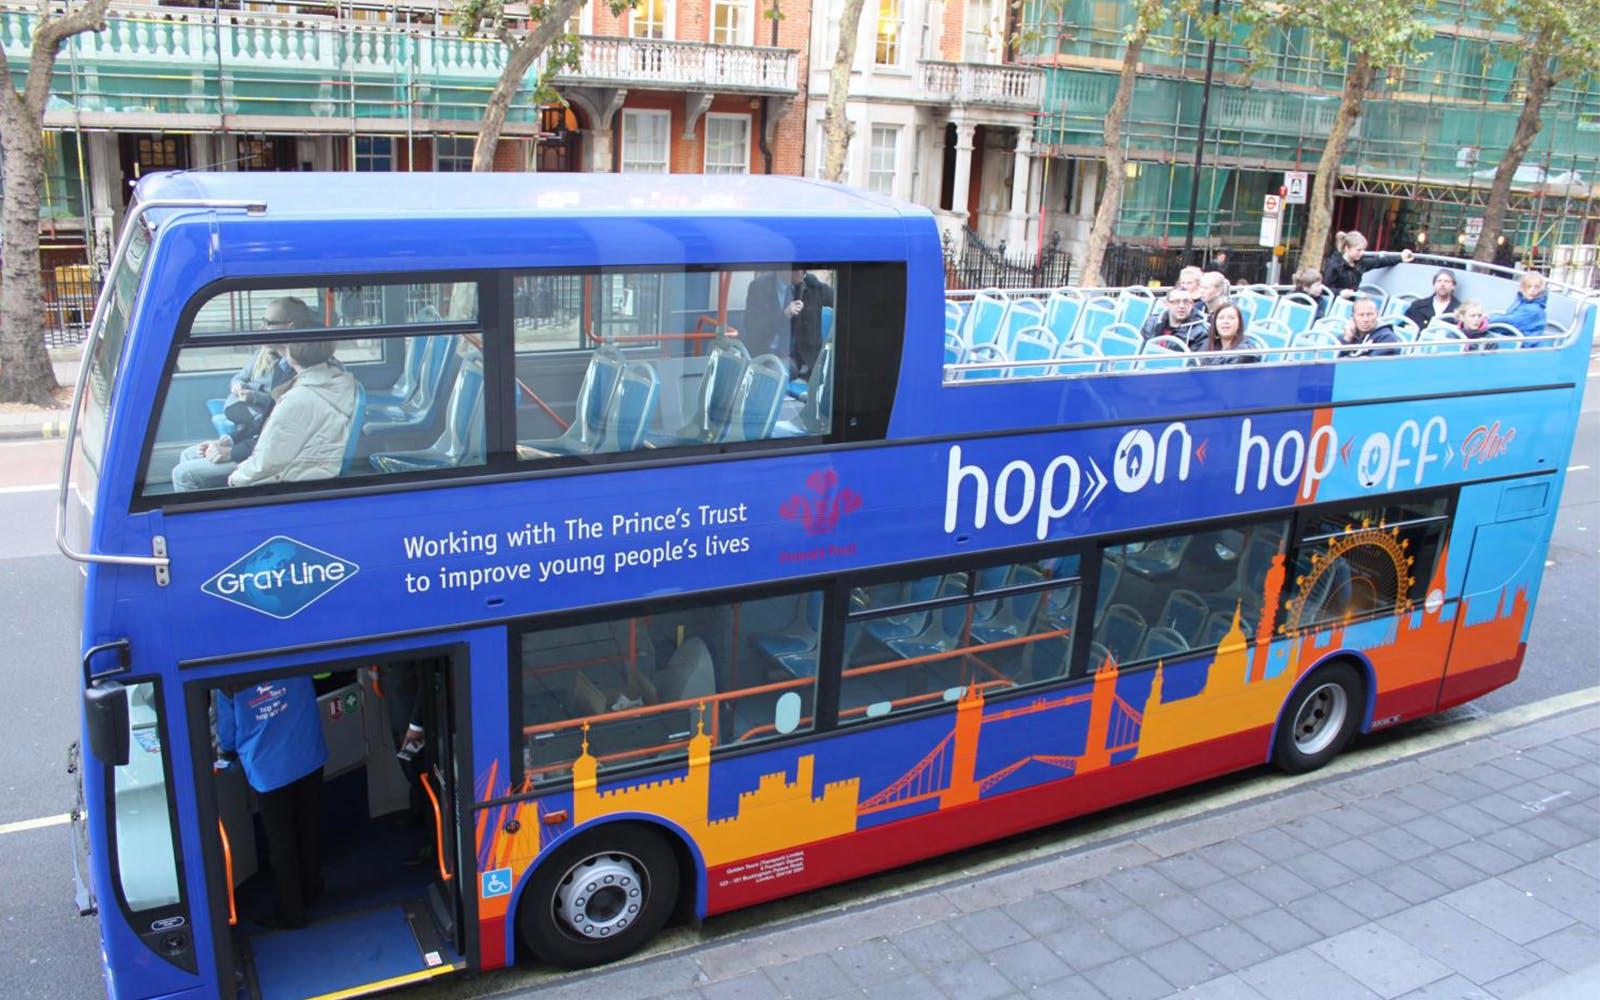 Comparing the Best London Hop On Hop Off Bus Tours